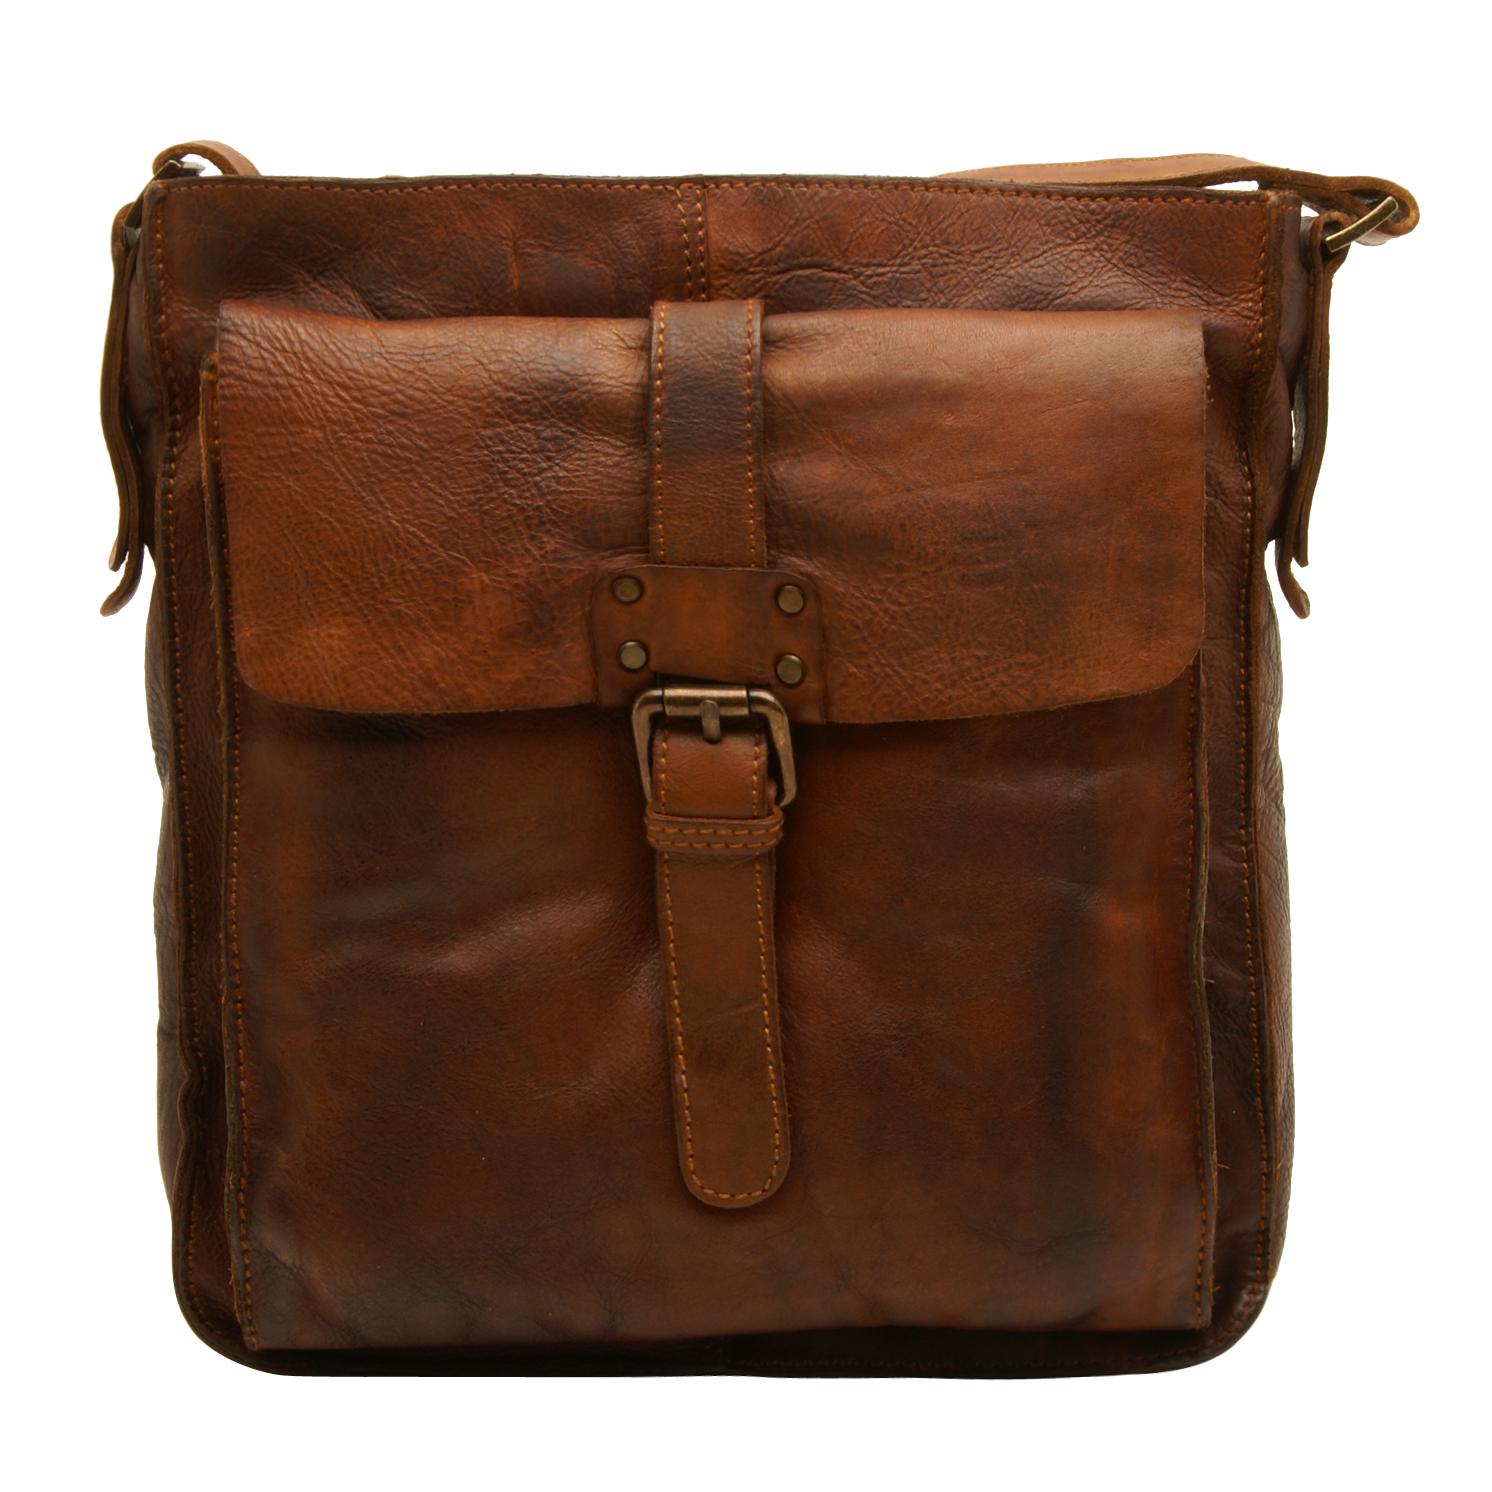 Ashwood – Tan Shoreditch Messenger Bag in Cowhide Leather